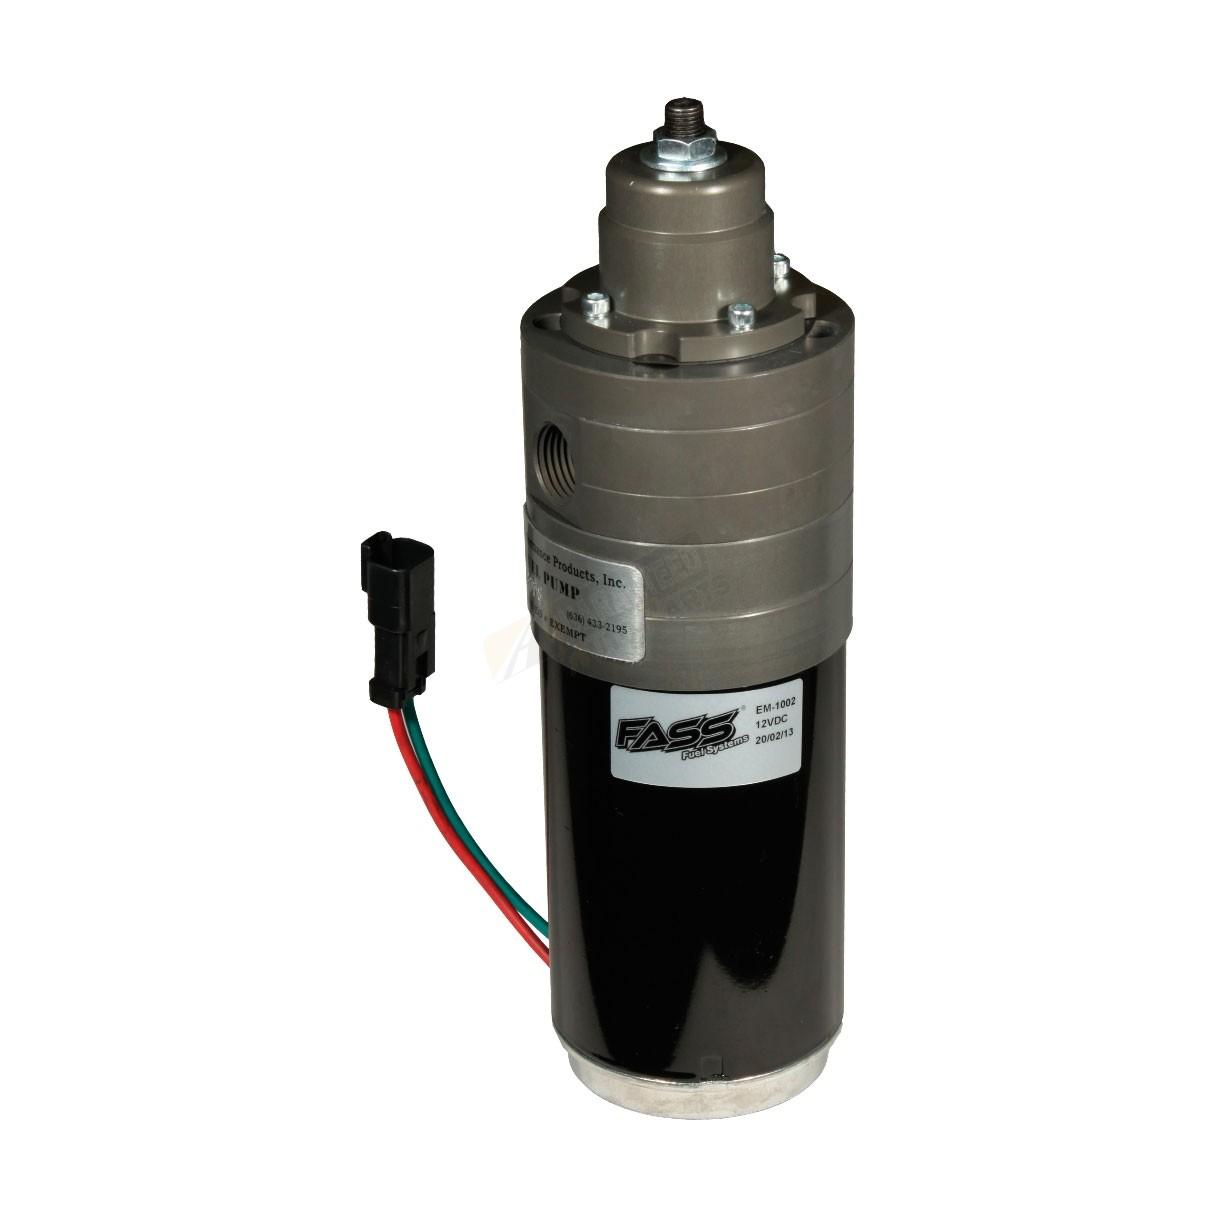 FASS Adjustable 125GPH Fuel Pump - FA F15 125G